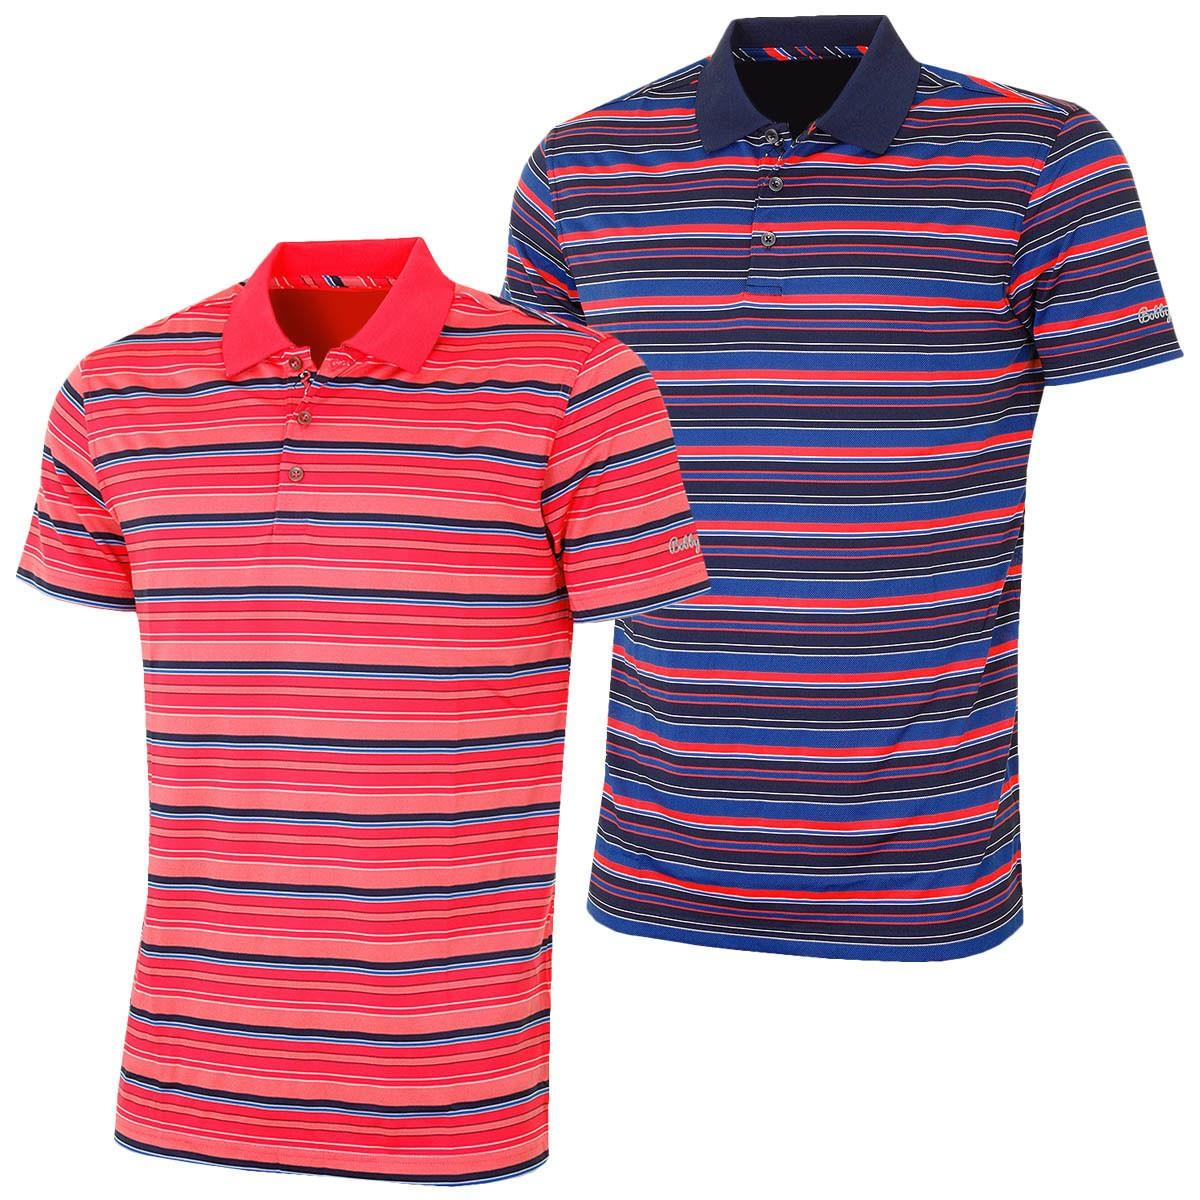 ff9c26da Bobby Jones Mens XH20 Nine Iron Multi Stripe Golf Polo Shirt - Men ...